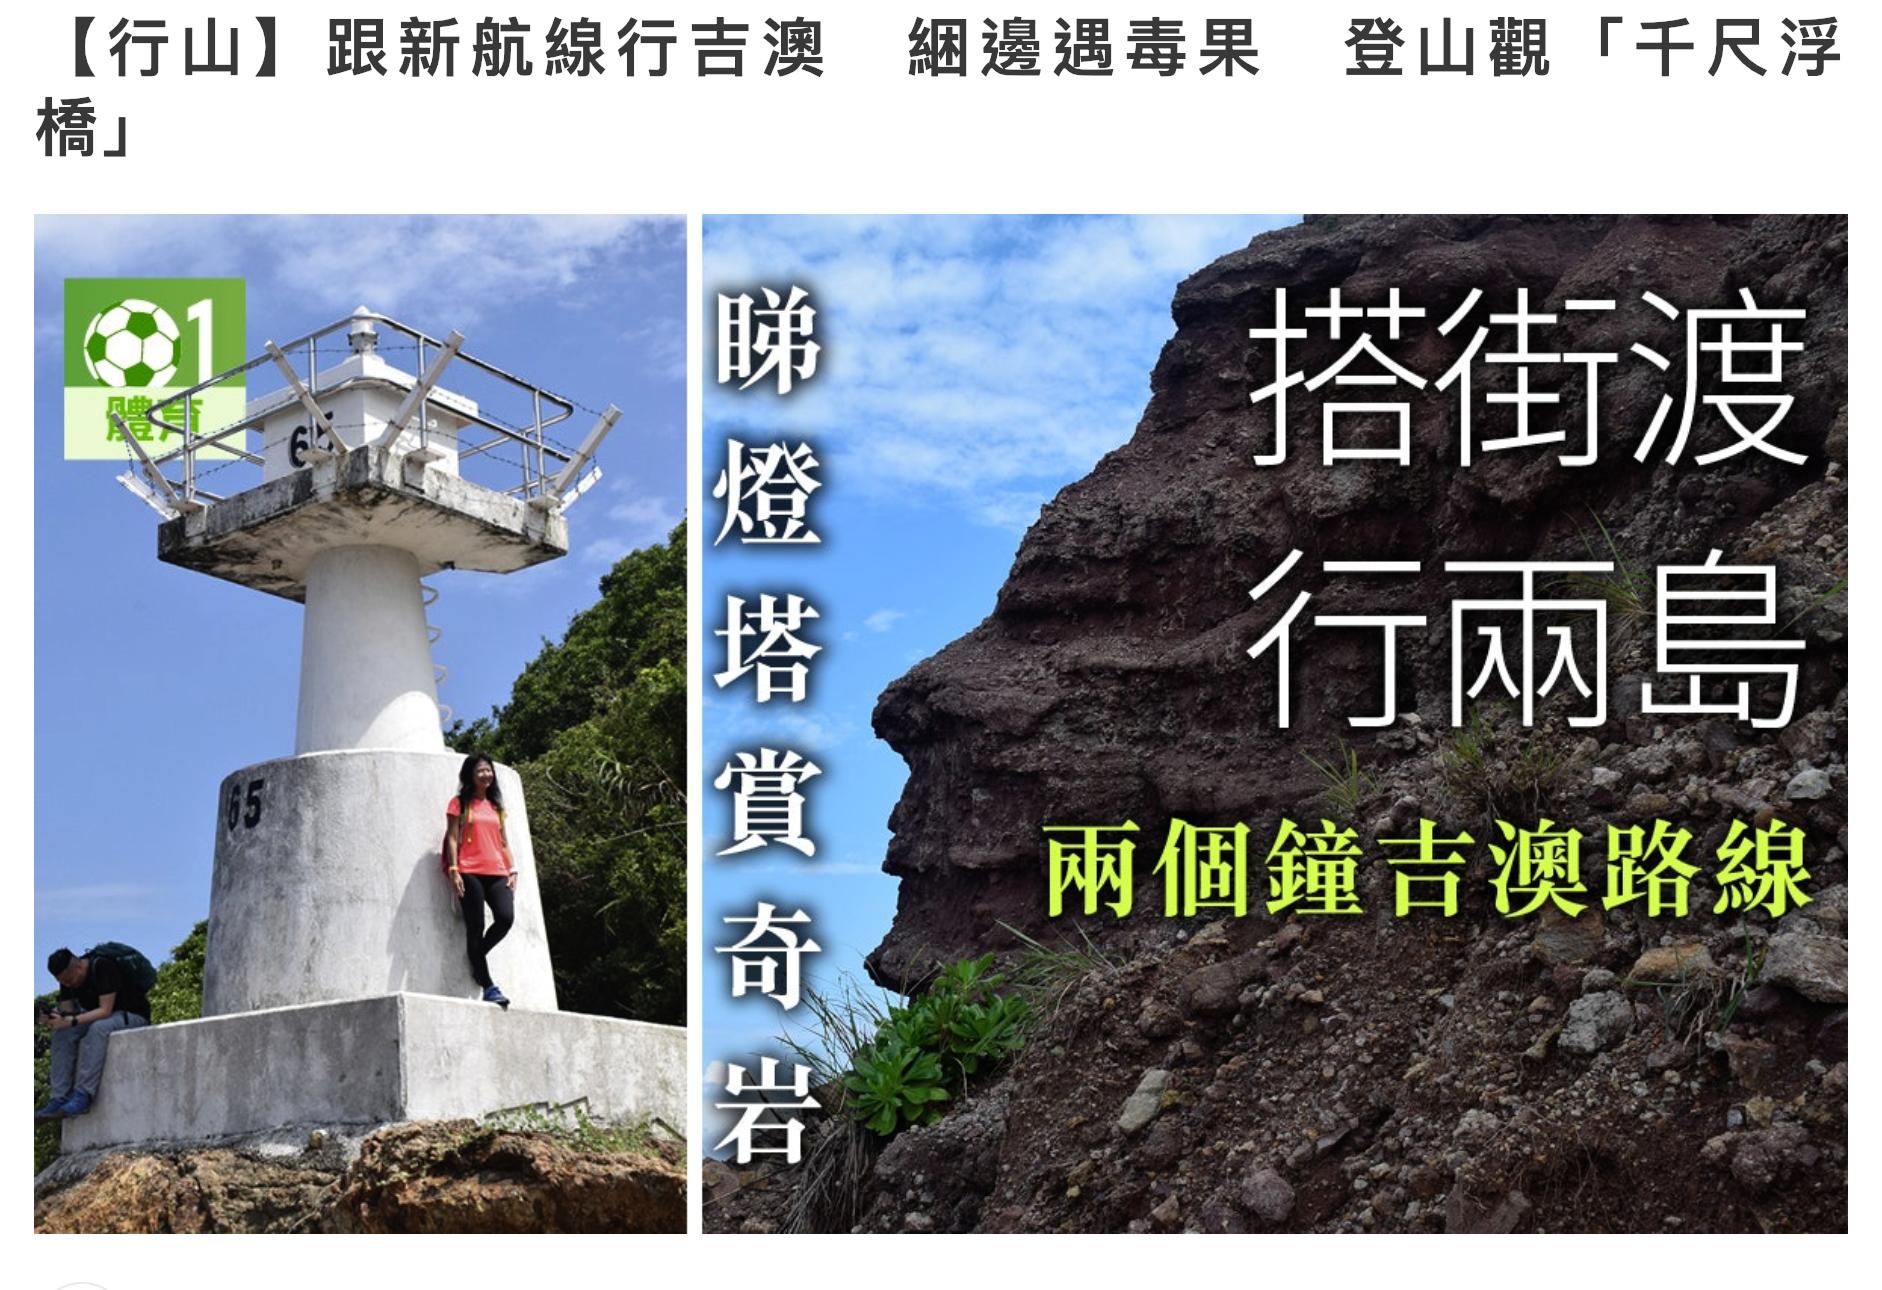 [2018.09.03]HK01--【行山】跟新航線行吉澳 綑邊遇毒果